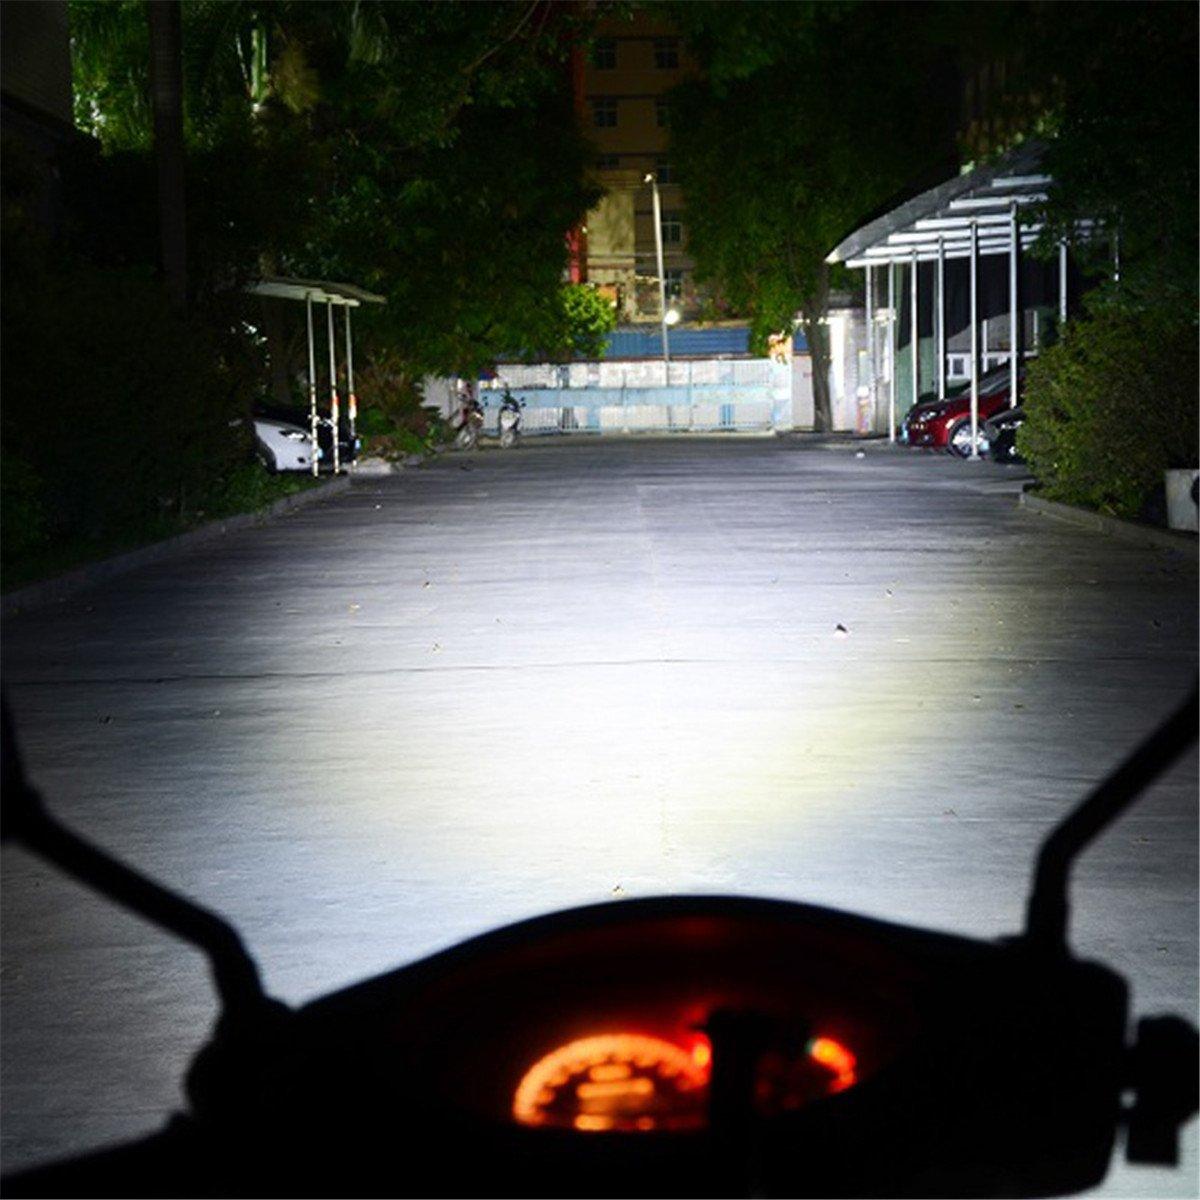 FEZZ LED Moto Bombillas Faro Scooter L�mpara Niebla H4 9003 HS1 18W 1000LM 6500K Blanca Hi Lo Beam con proyector